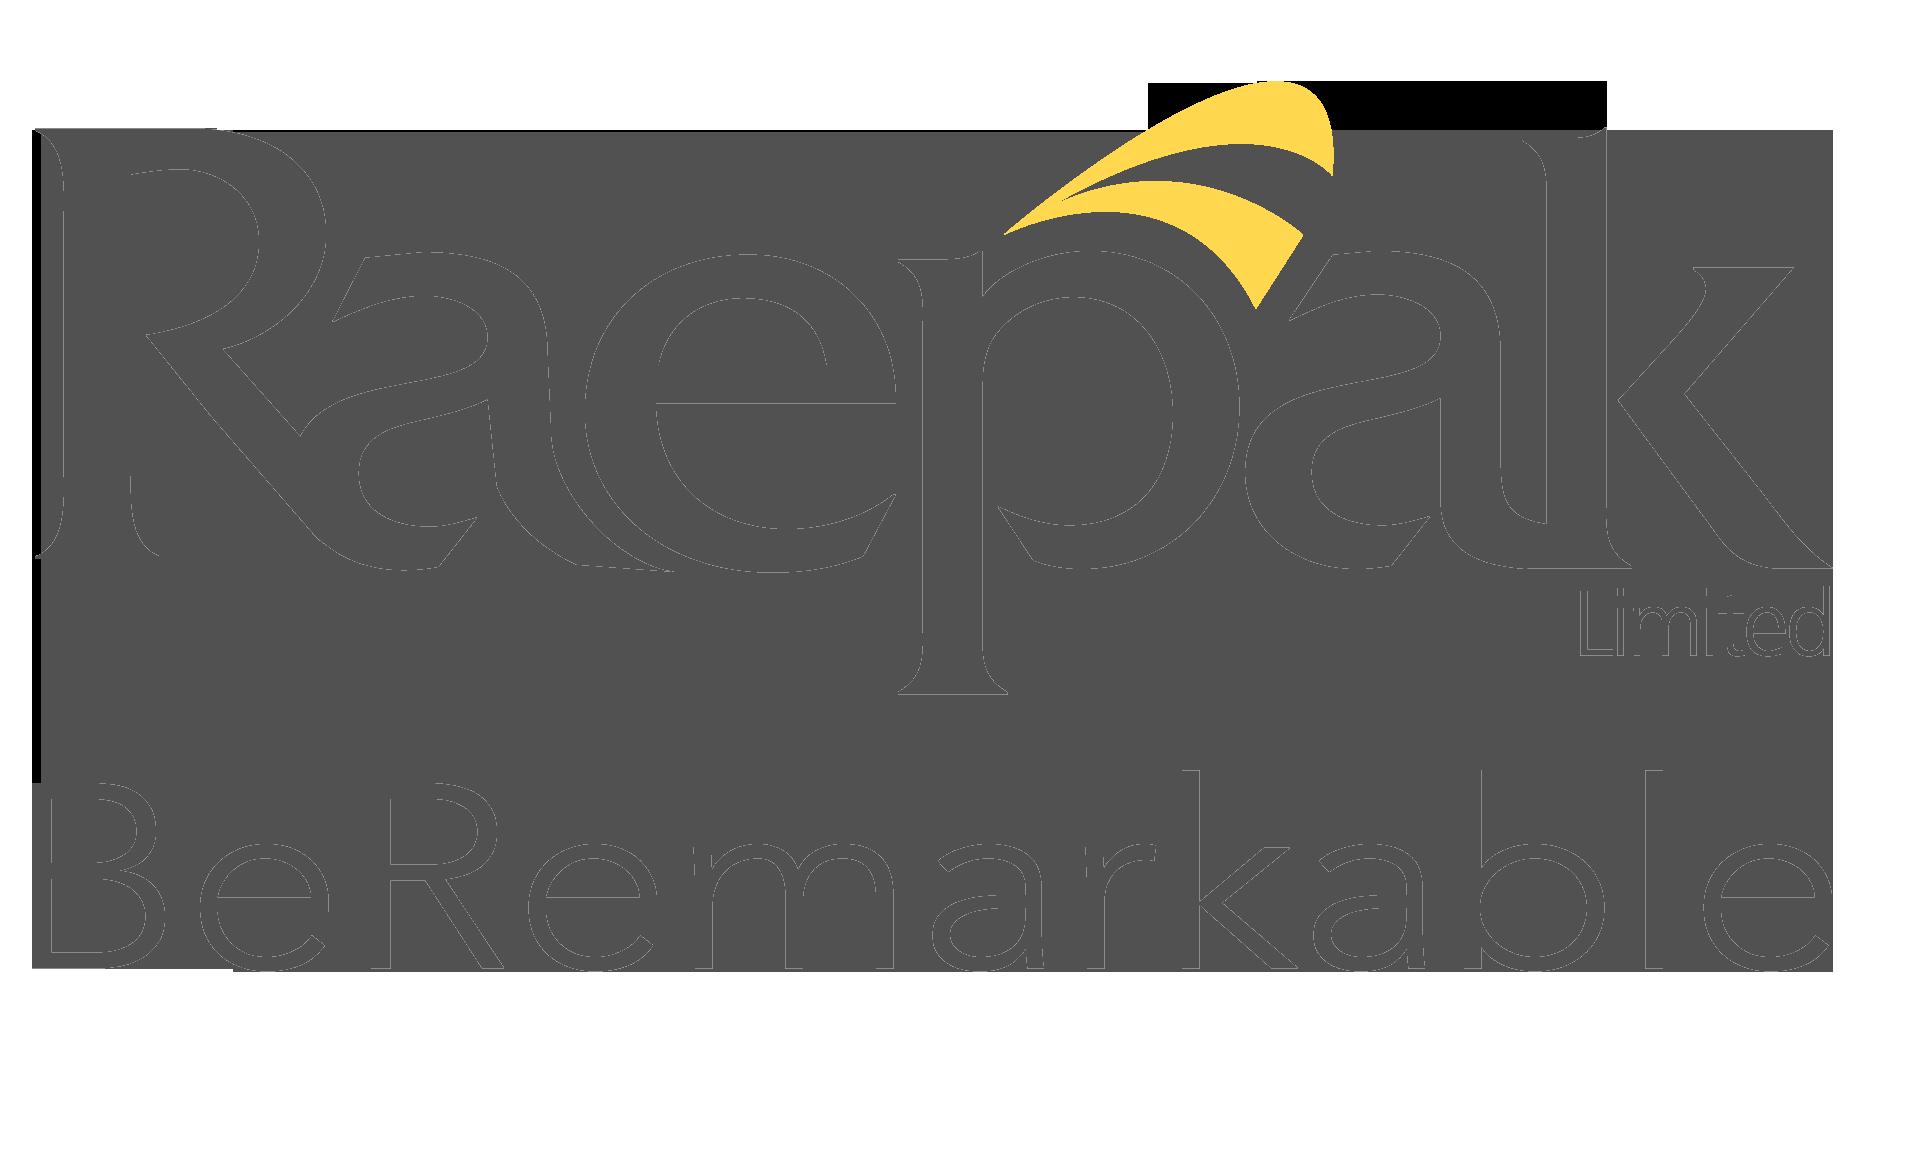 Raepak Ltd